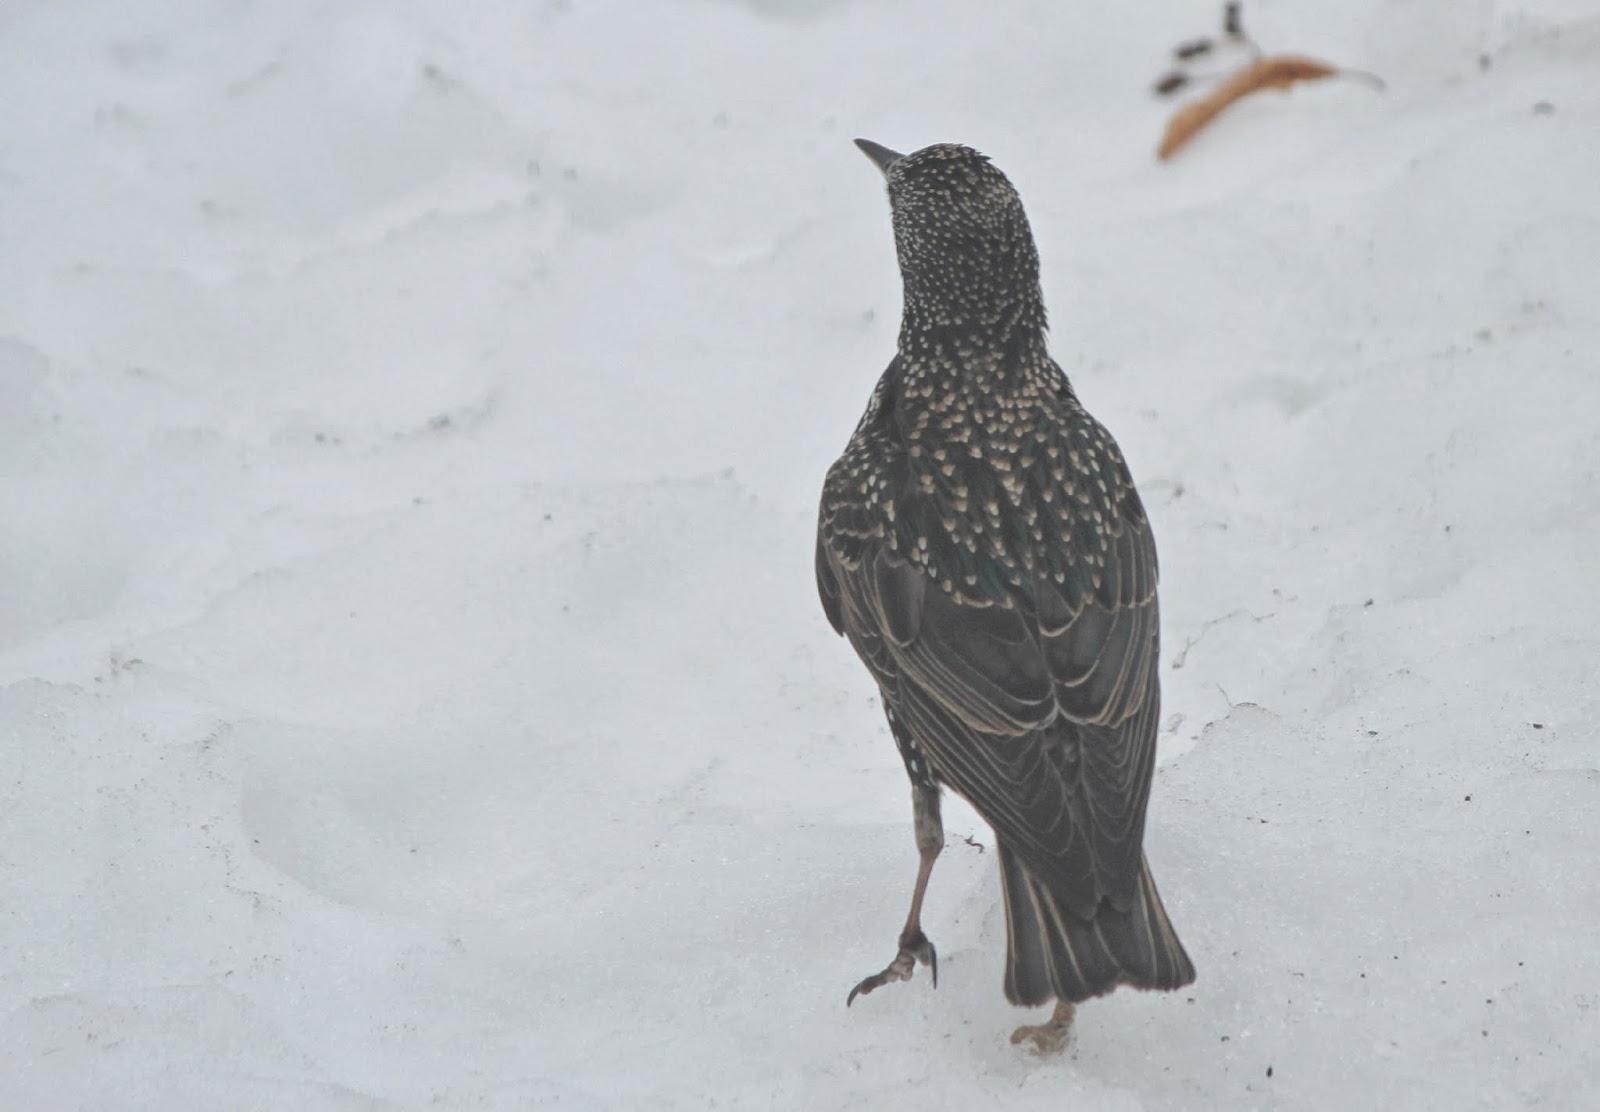 the great backyard bird count